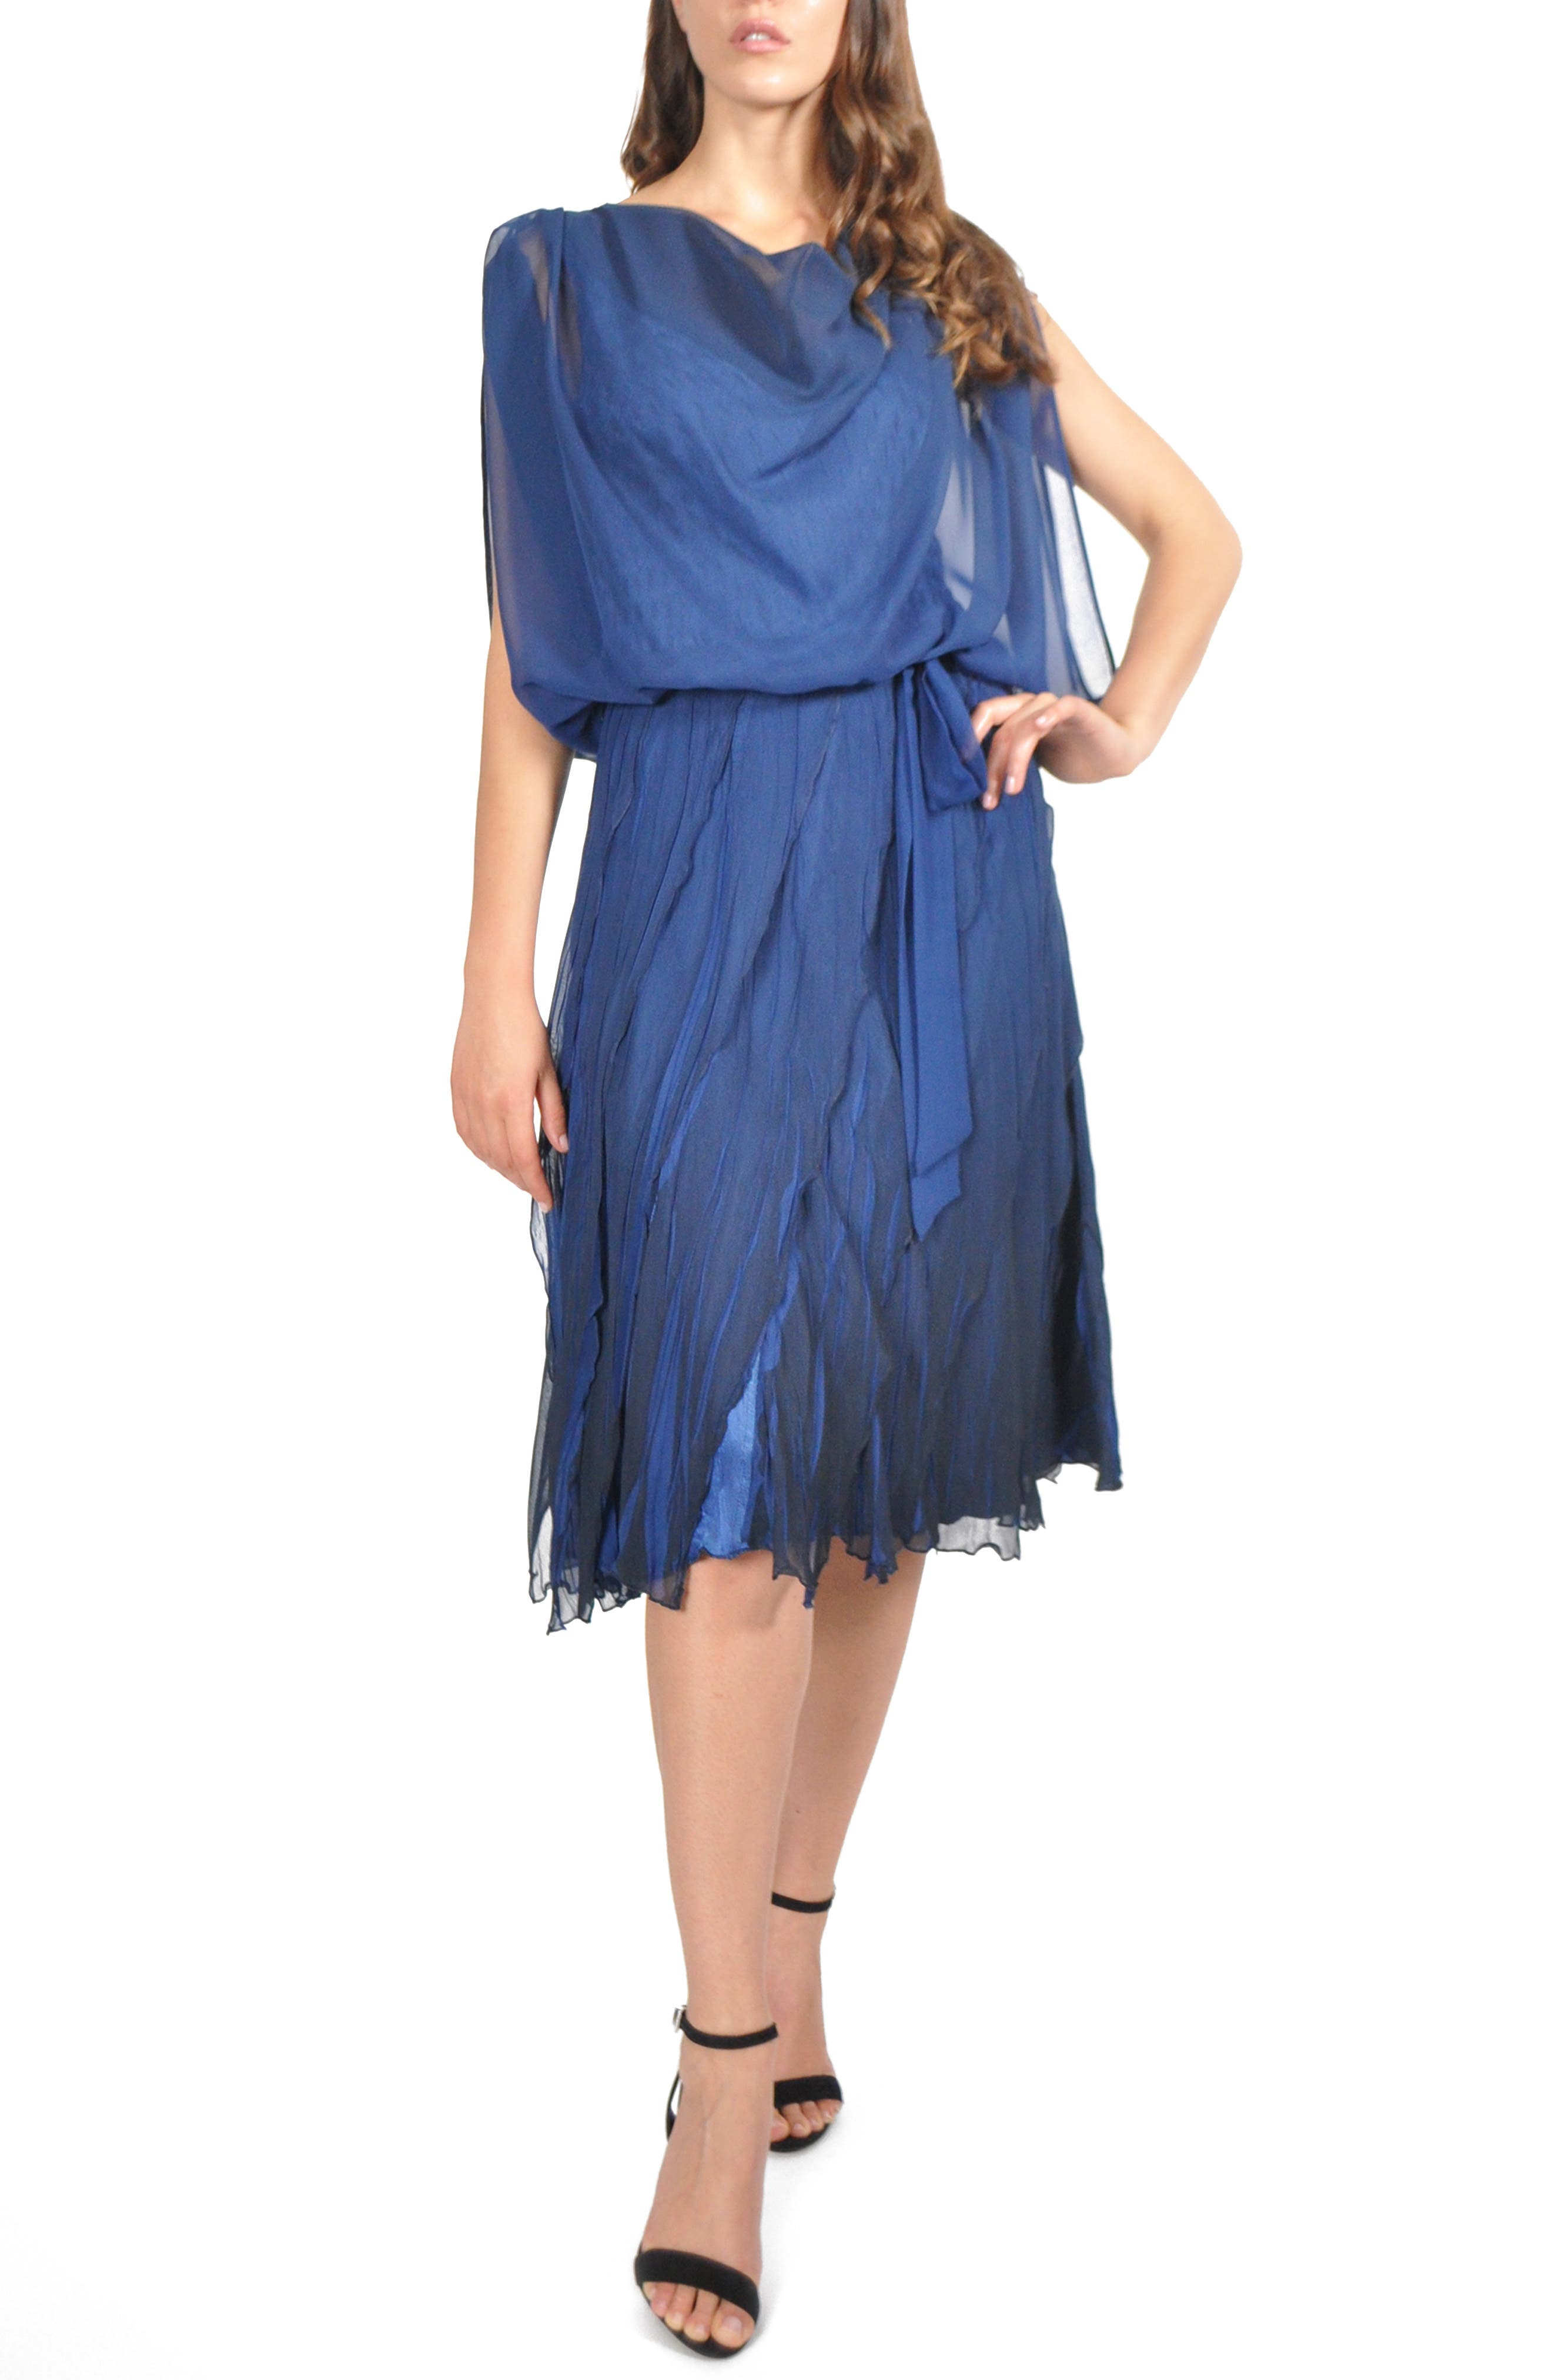 Blouson Tiered Dress,                             Main thumbnail 1, color,                             NAVY BLACK OMBRE